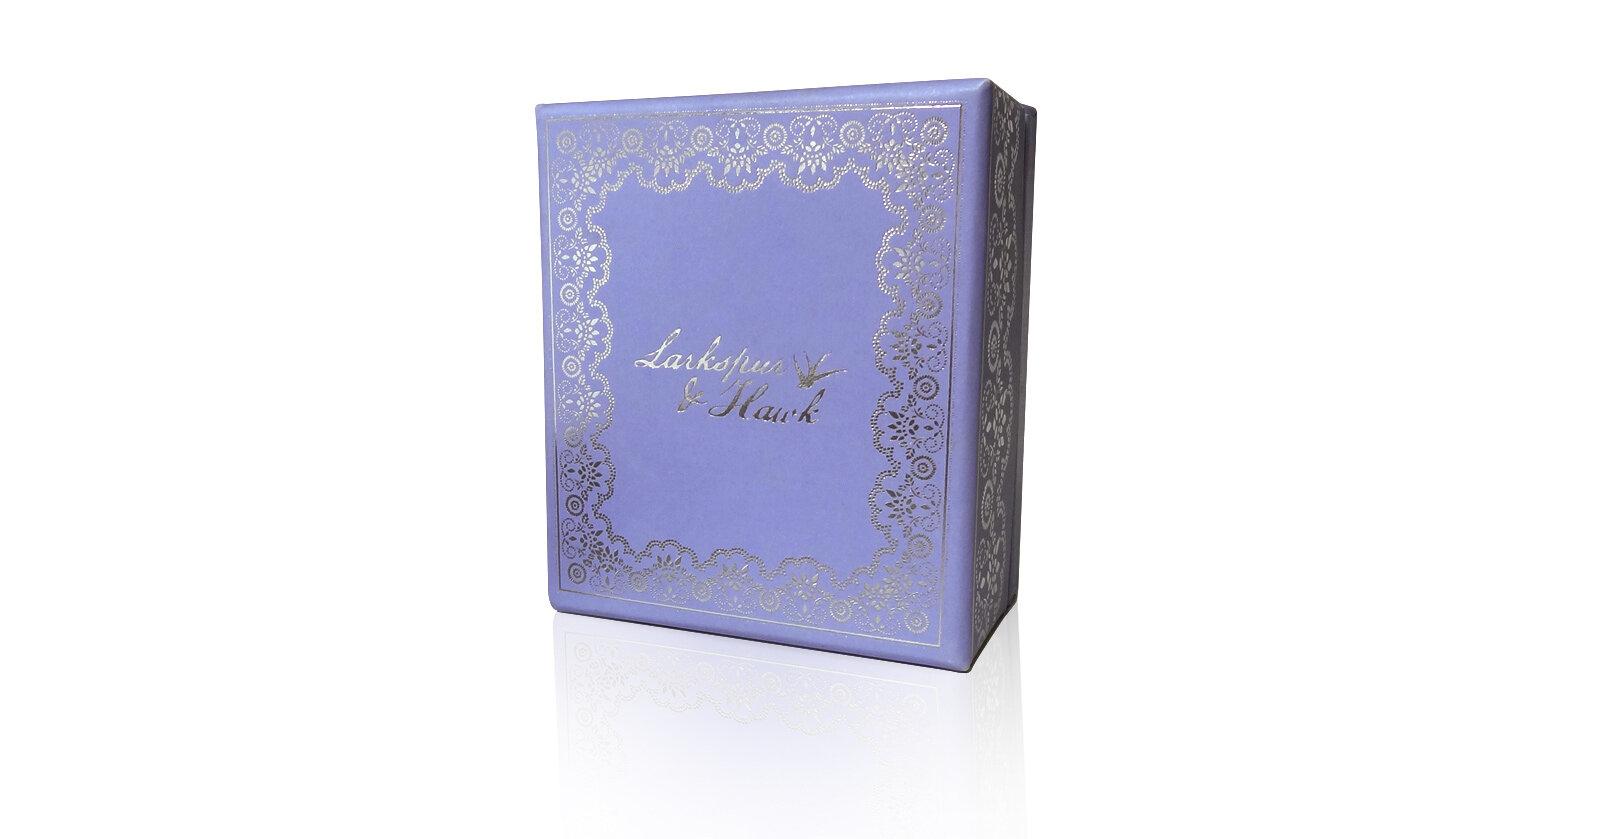 Larkspur-Hawk-Box-Bewelry-Packaging-Company-Design-5.jpg